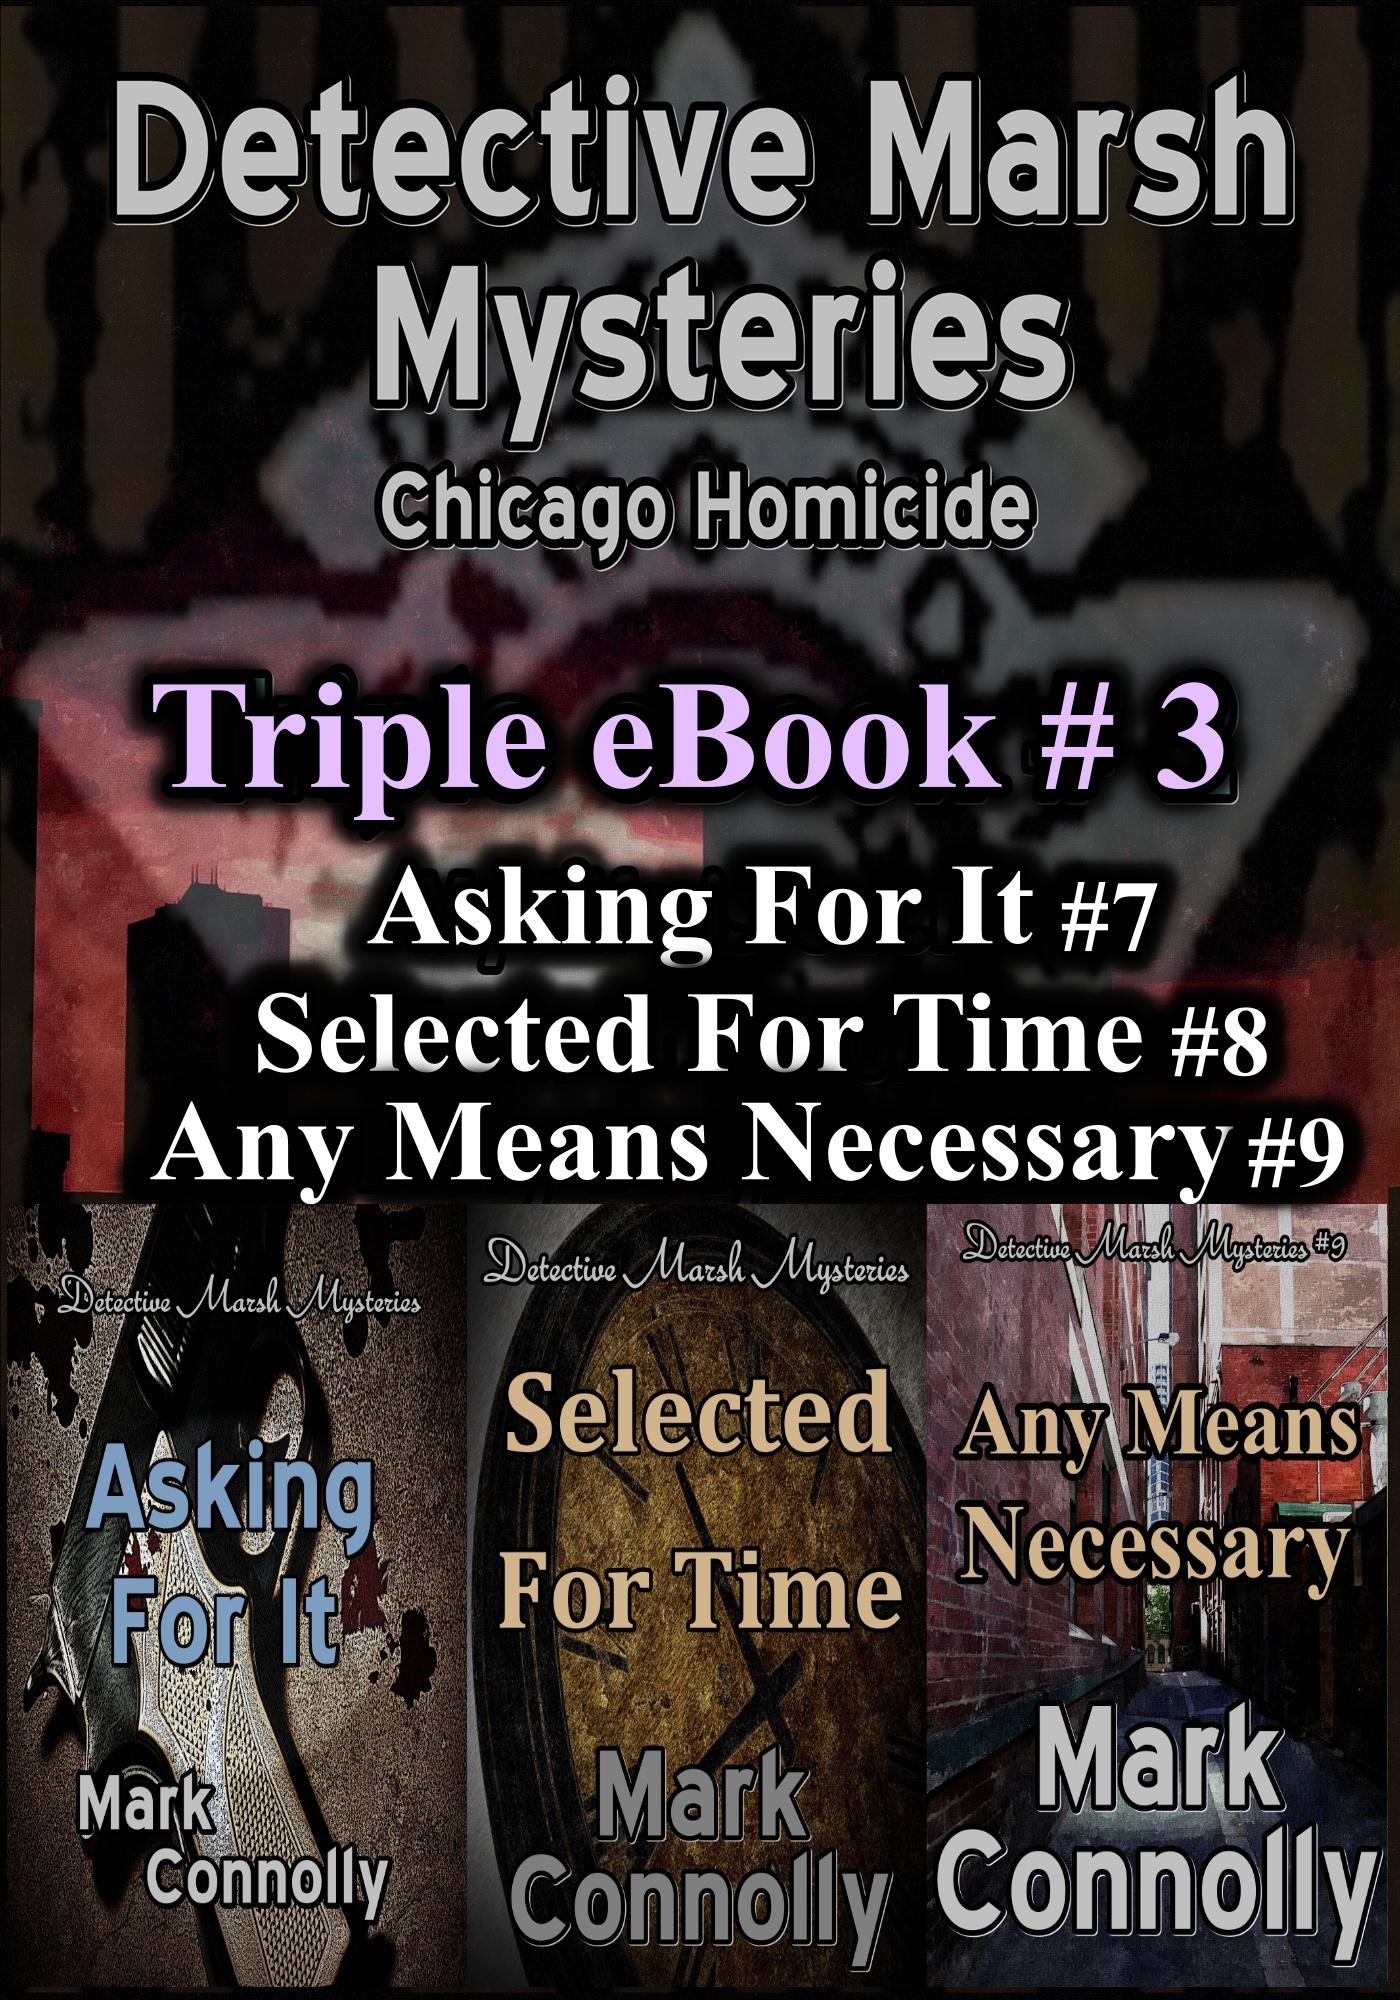 Detective Marsh Mysteries Triple eBook #3, an Ebook by Mark Connolly